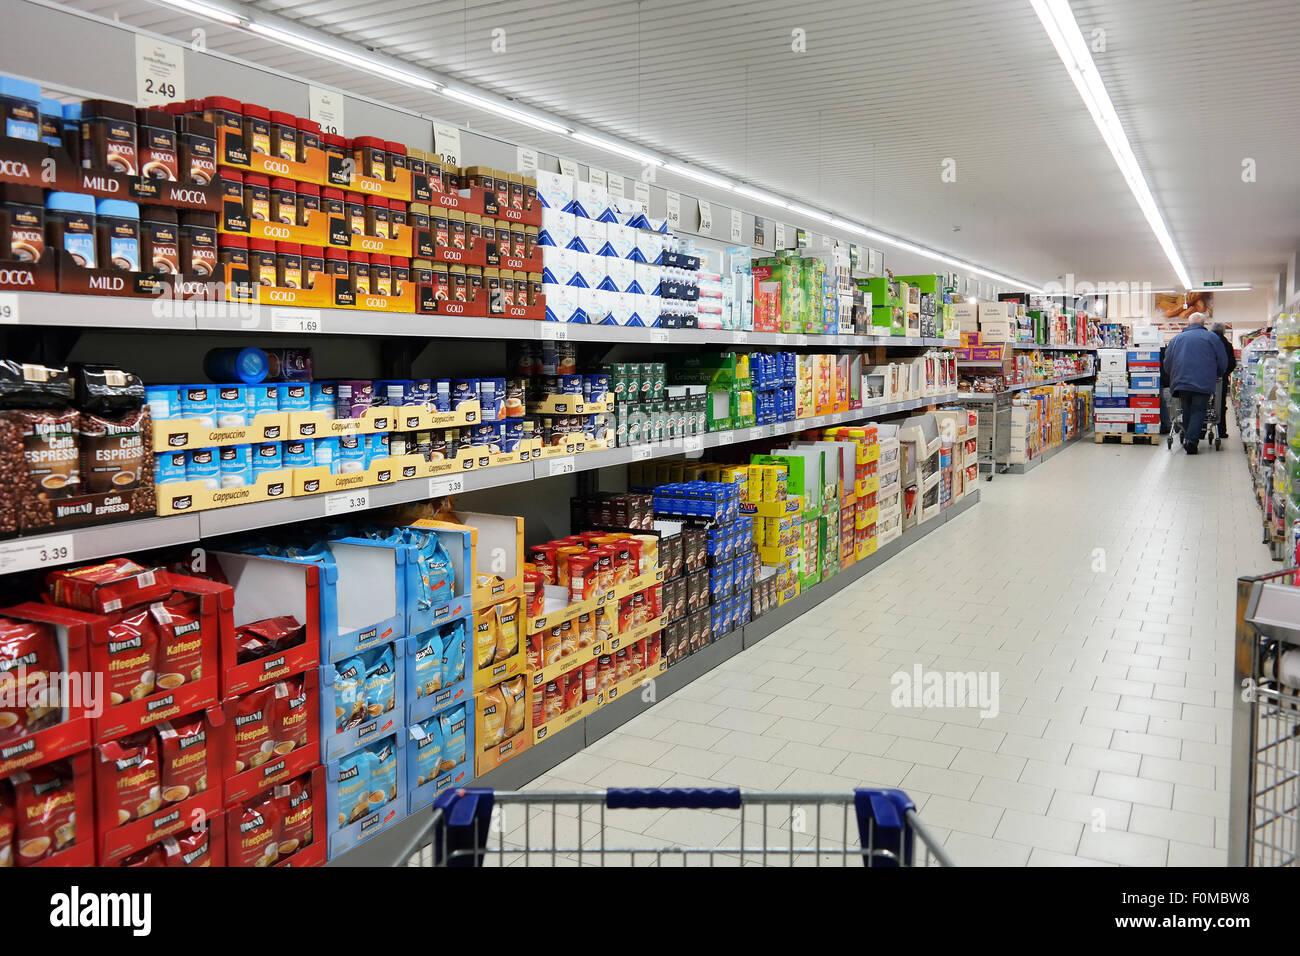 Inside a aldi supermarket stock photo royalty free image for Aldi international cuisine